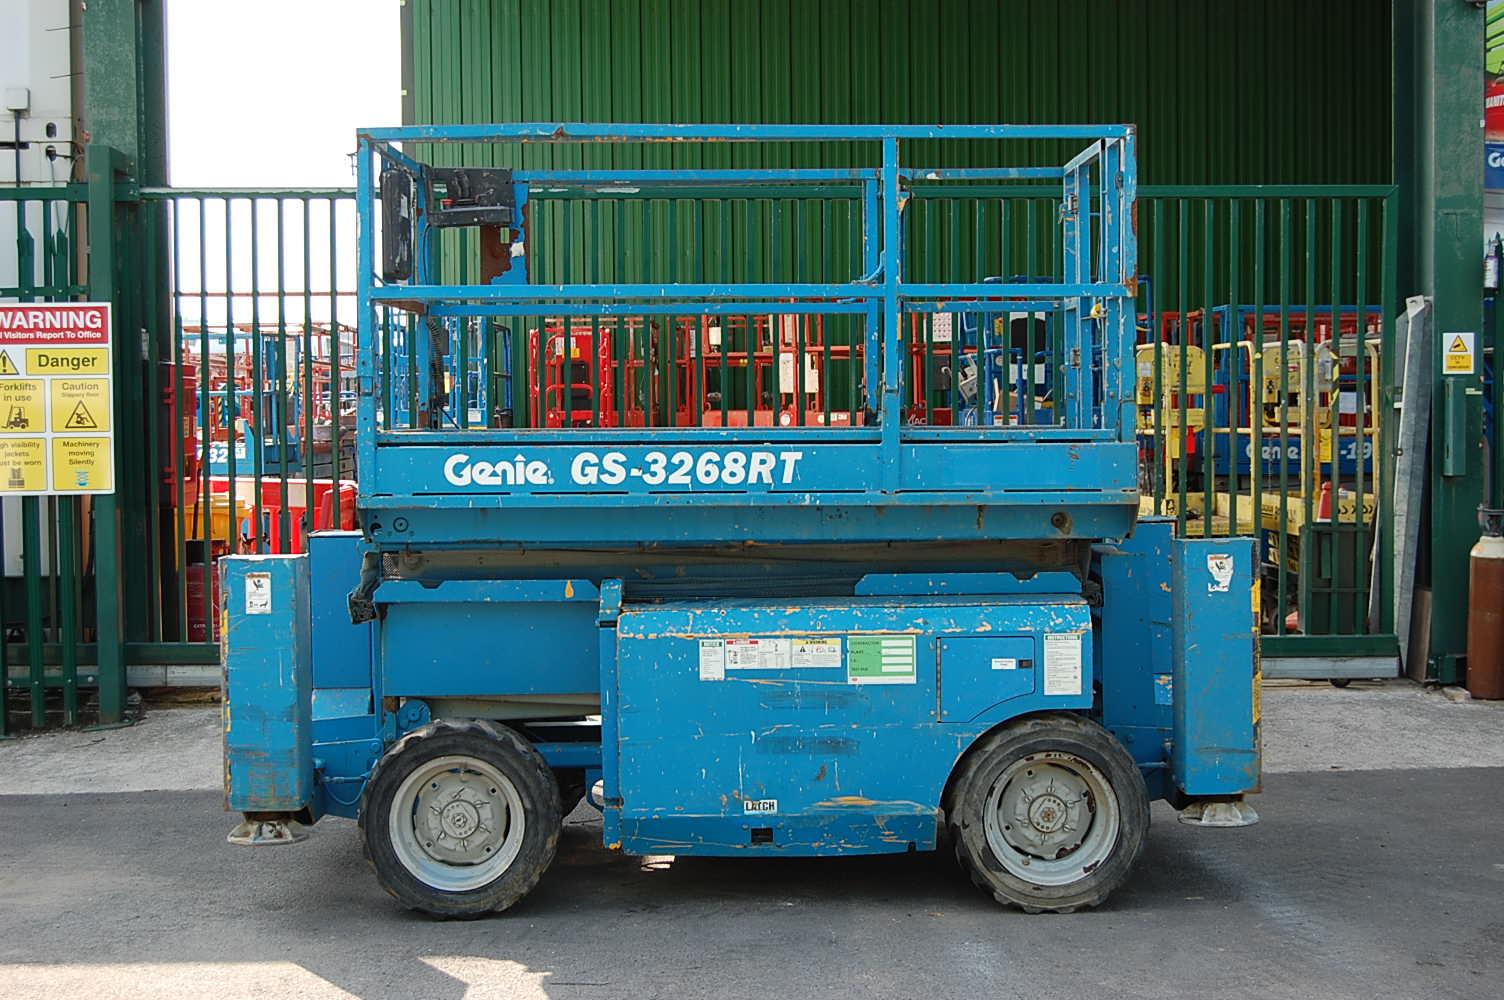 2008 Genie 3268RT Rough Terrain Diesel Scissor Lift  11.79m